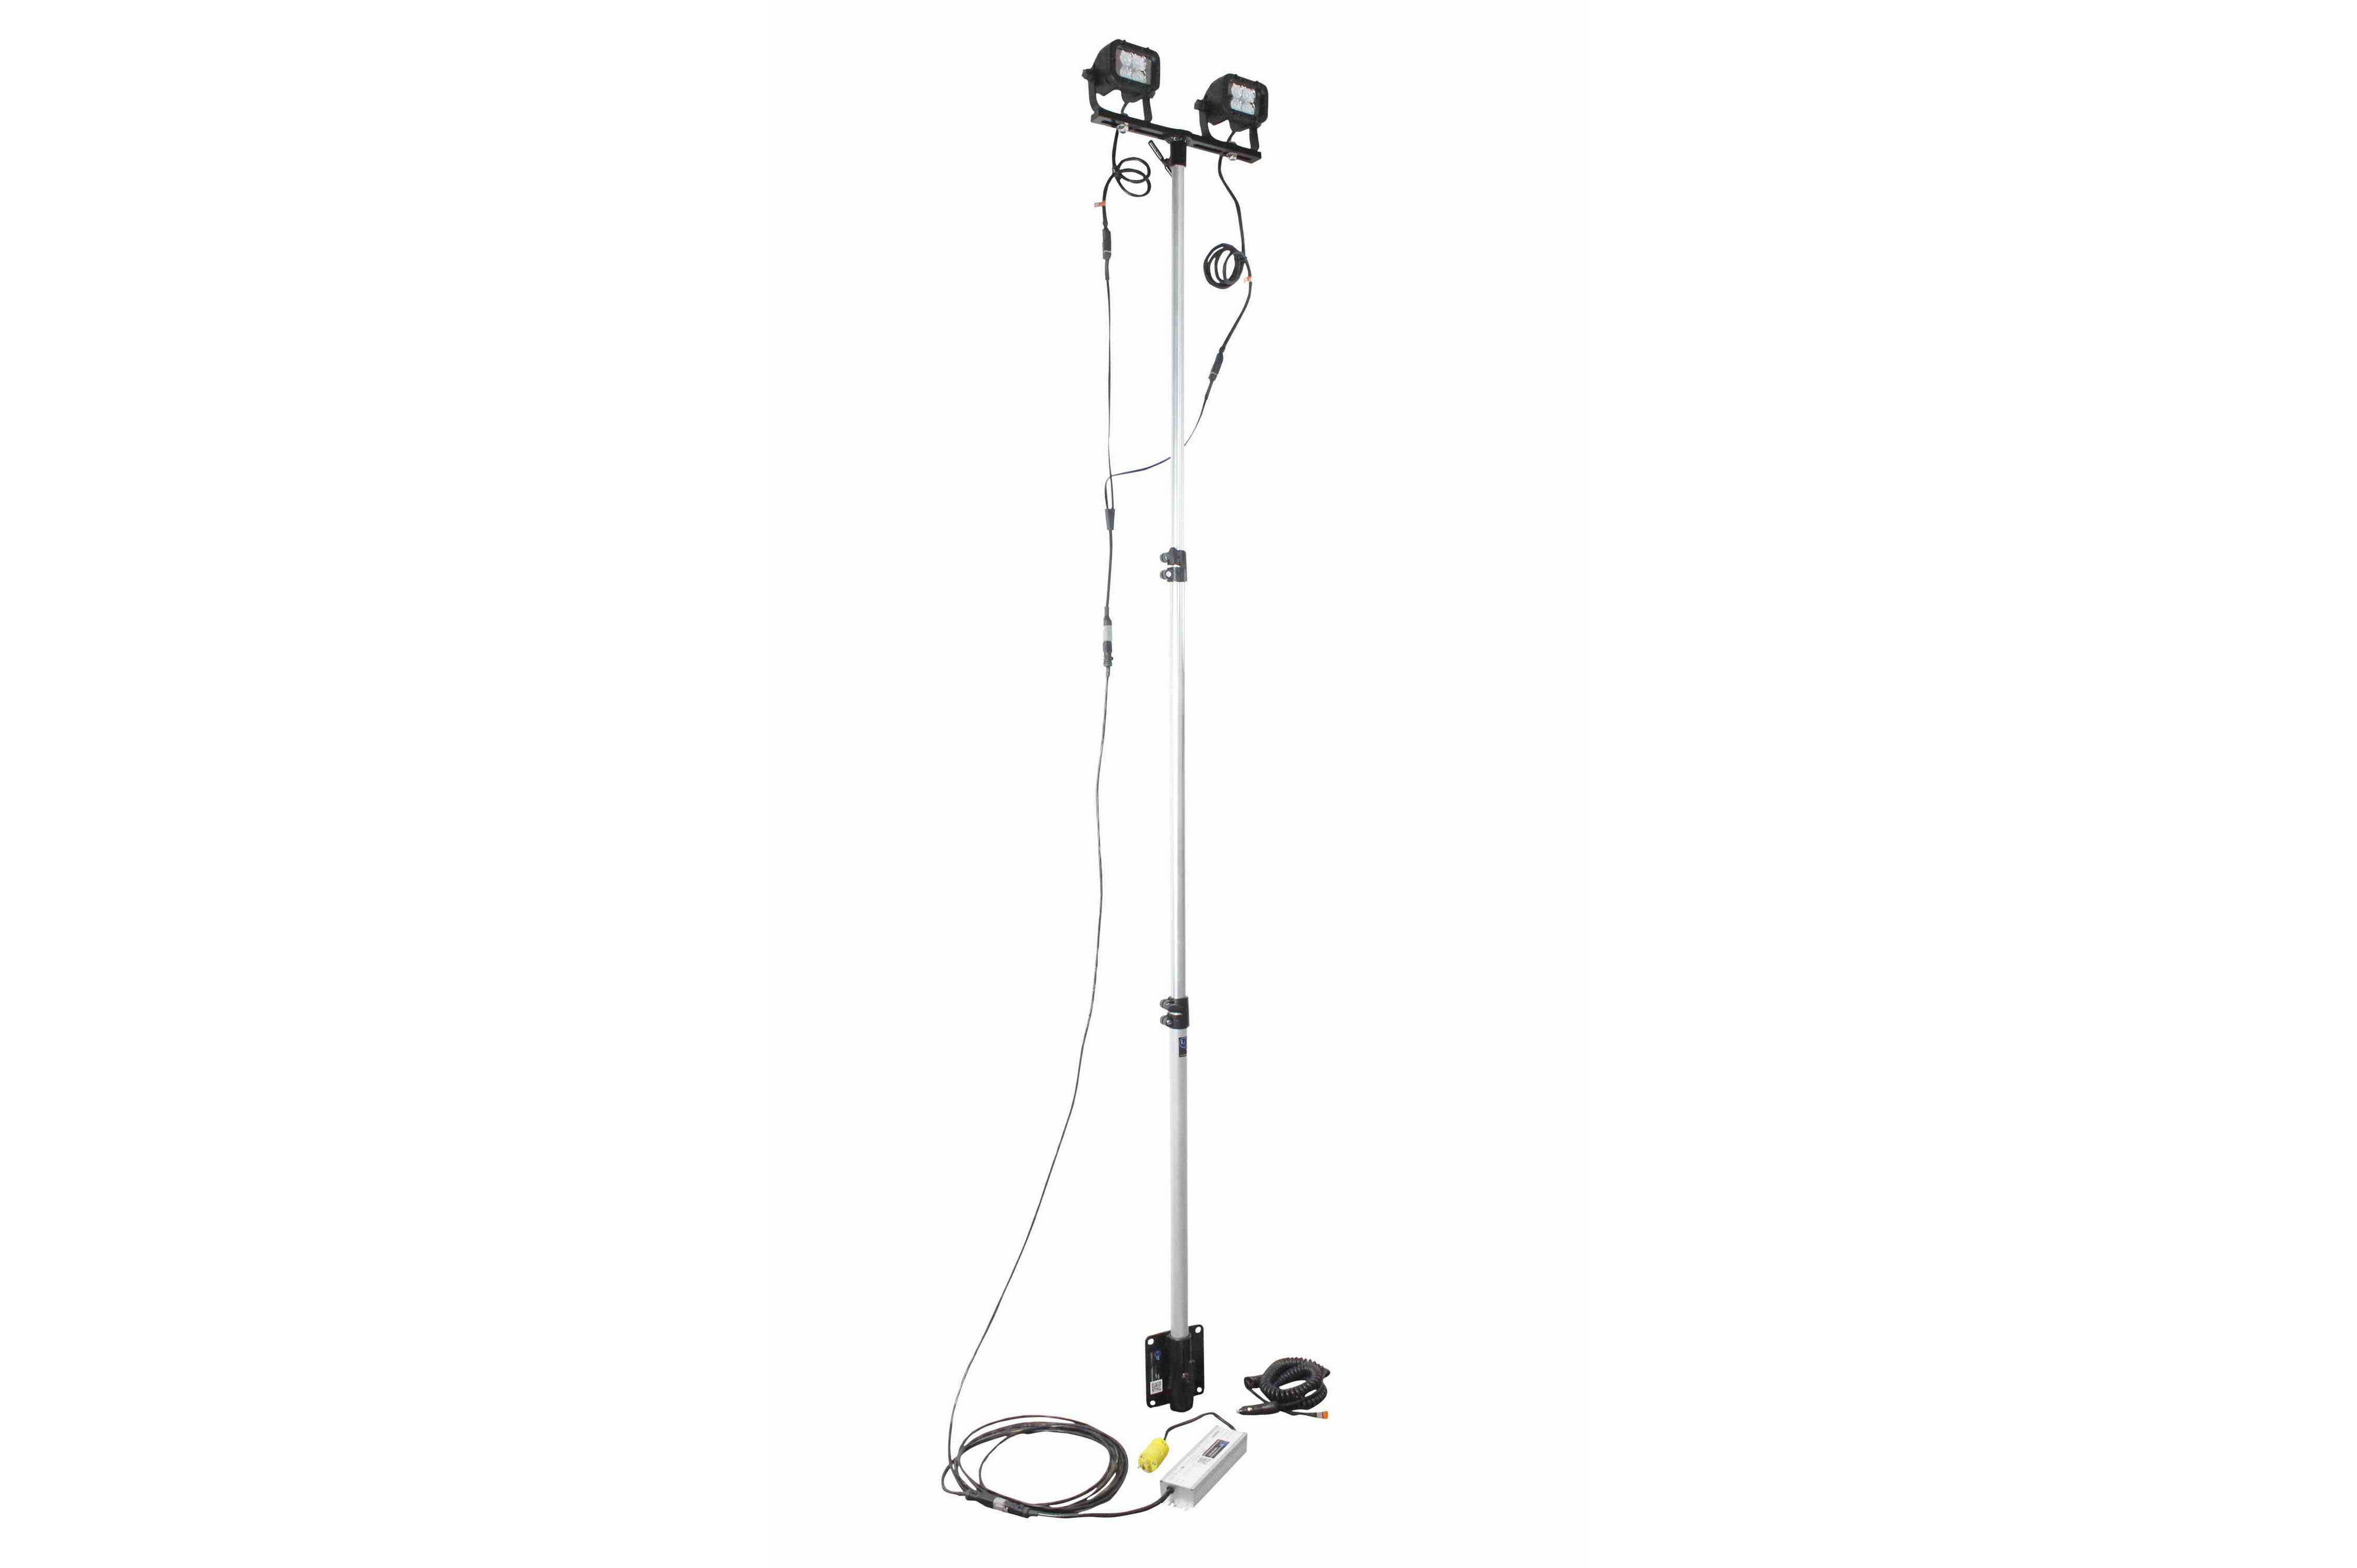 24 Watt Portable Led Telescoping Light Pole